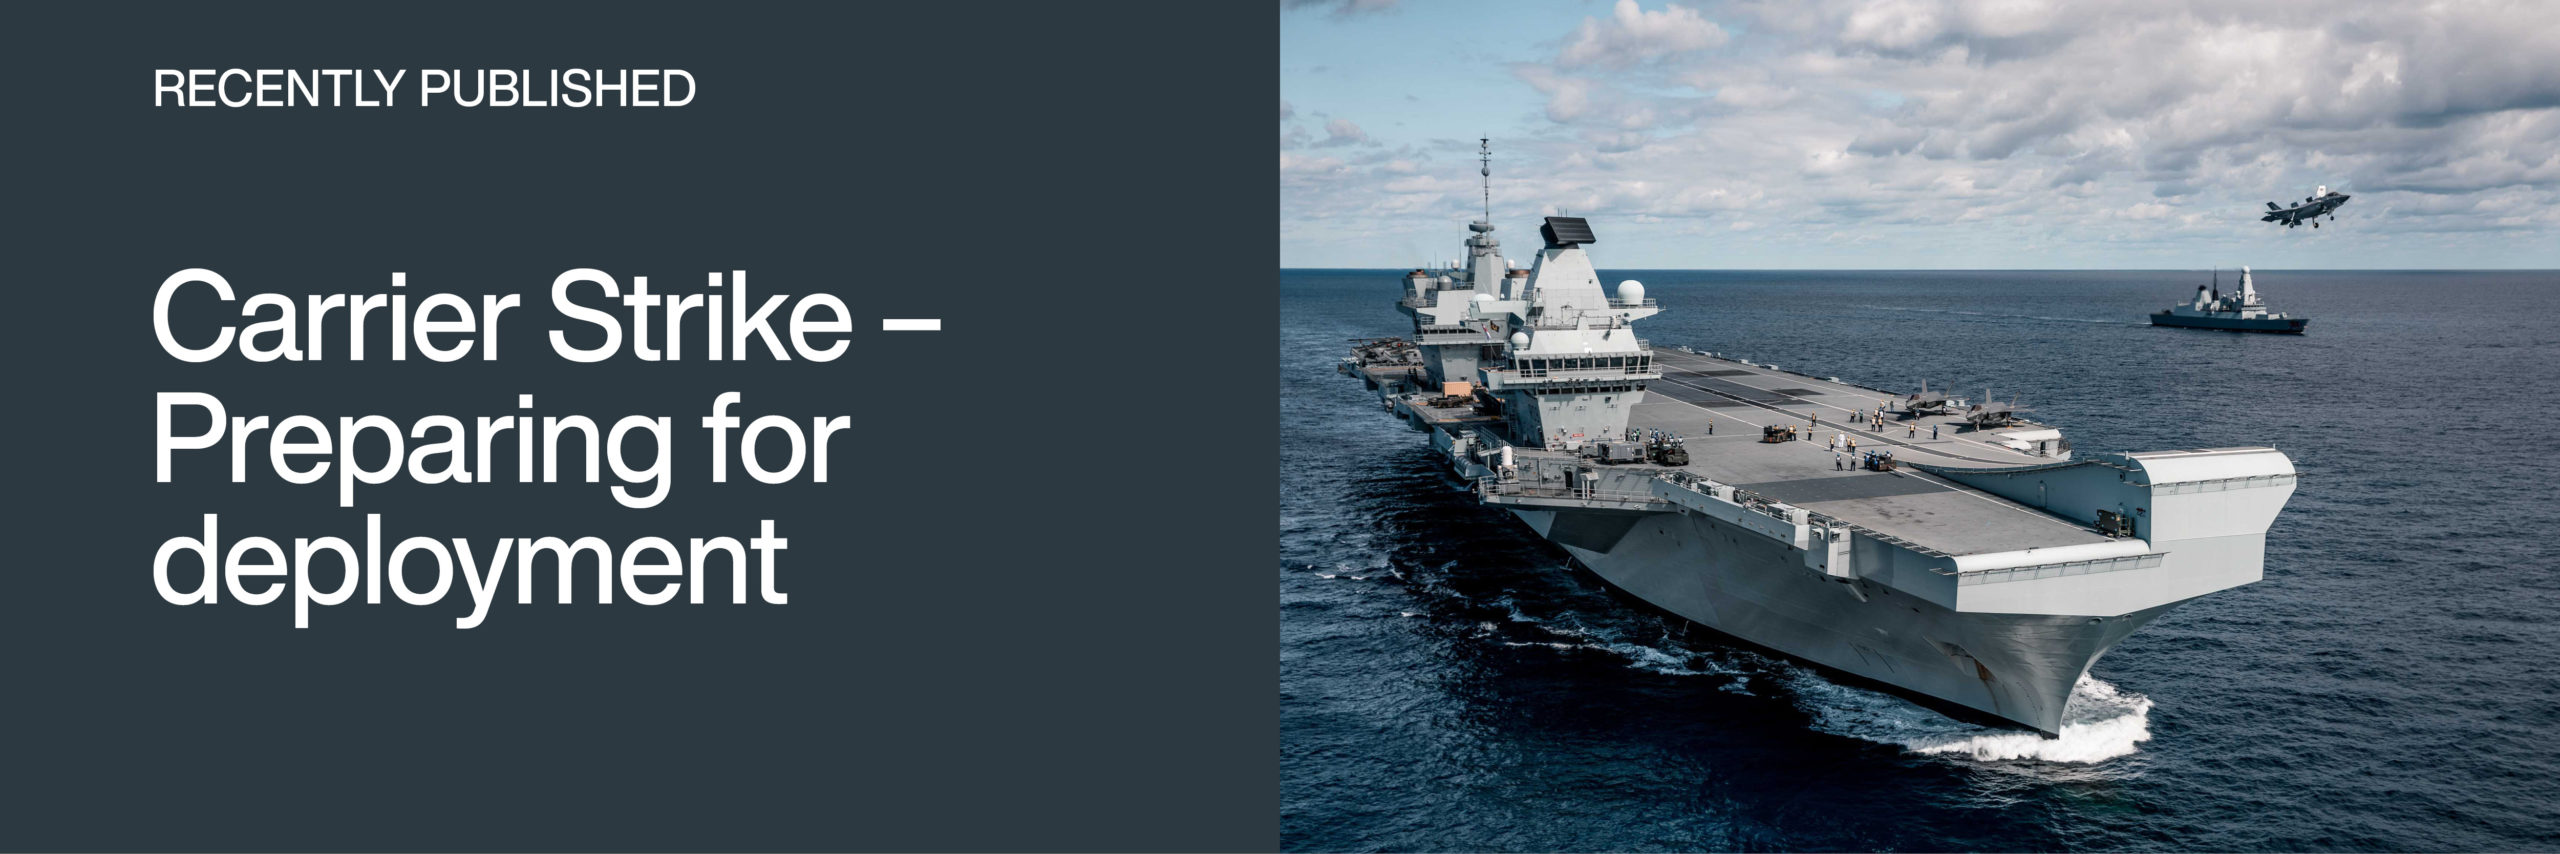 Recently published: Carrier Strike - Preparing for deployment